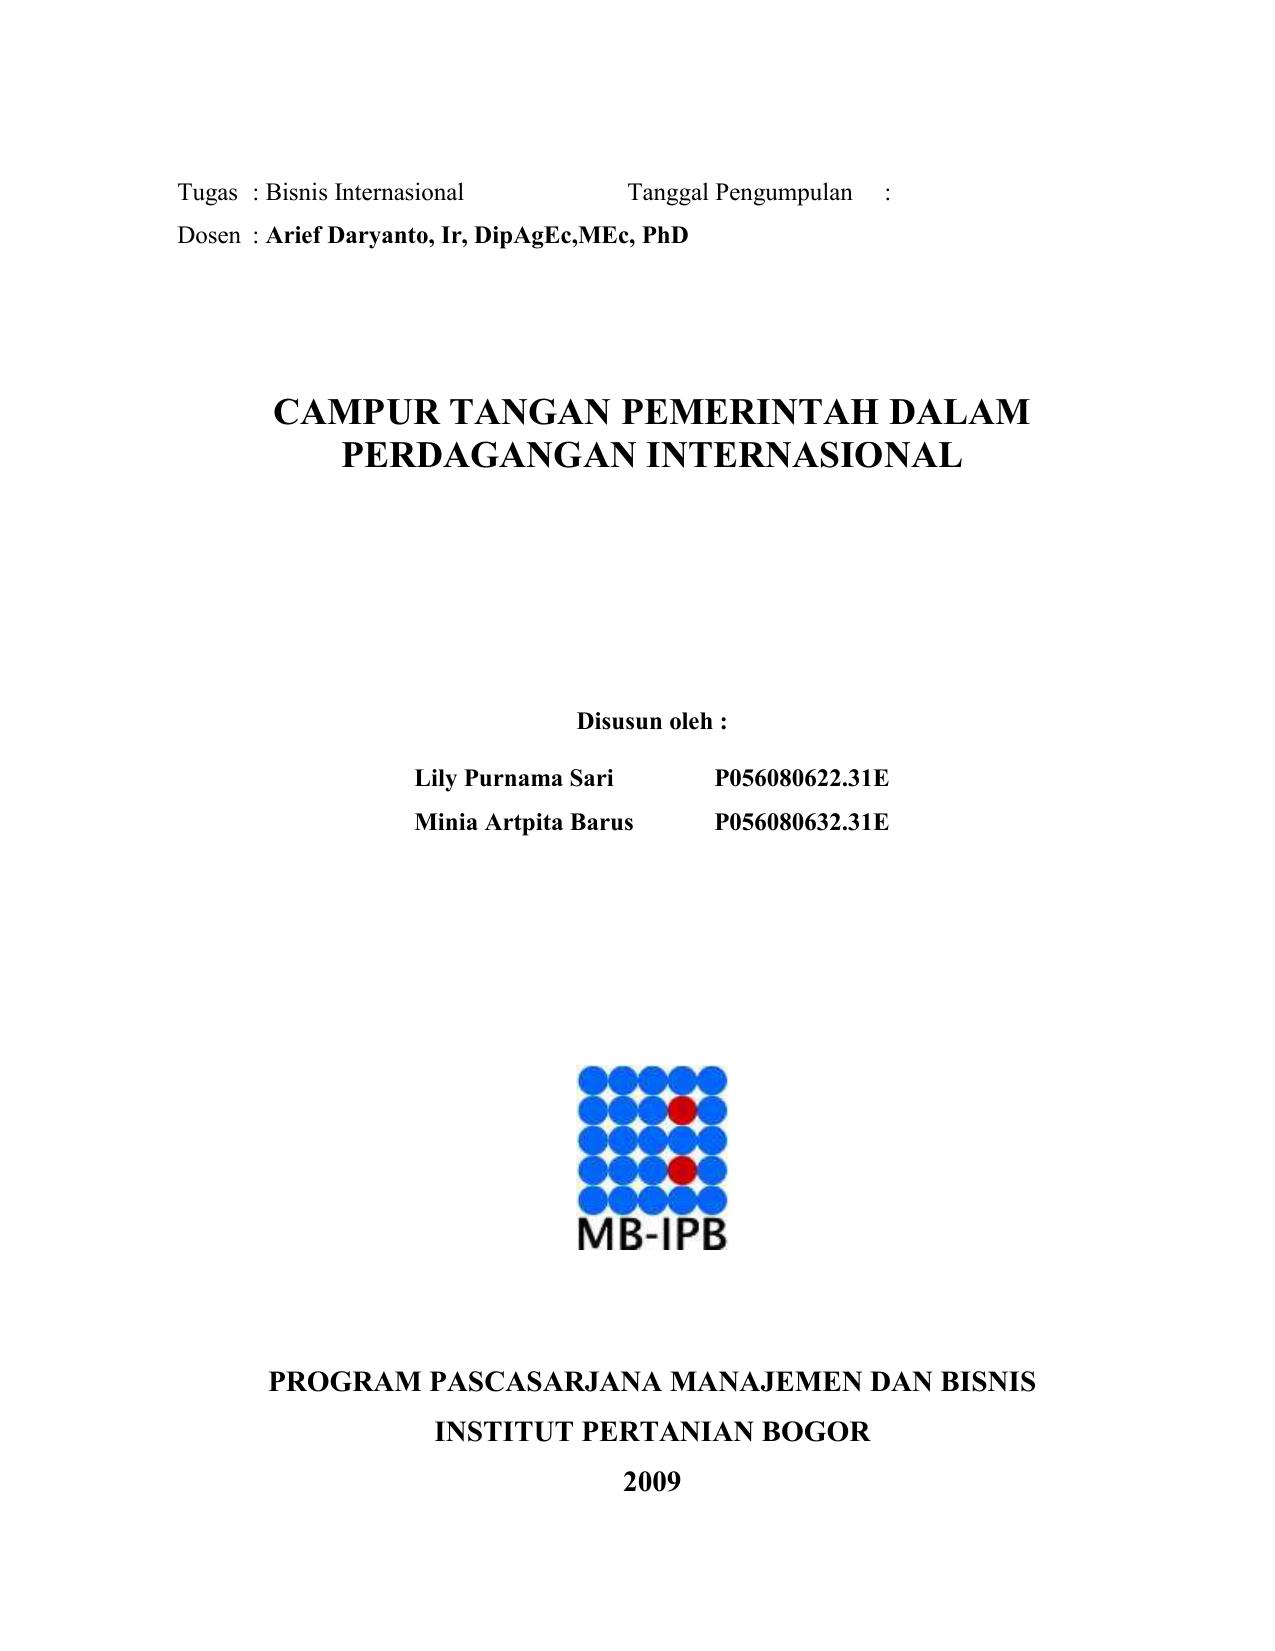 sistem klasifikasi perdagangan harmonisasi indonesia